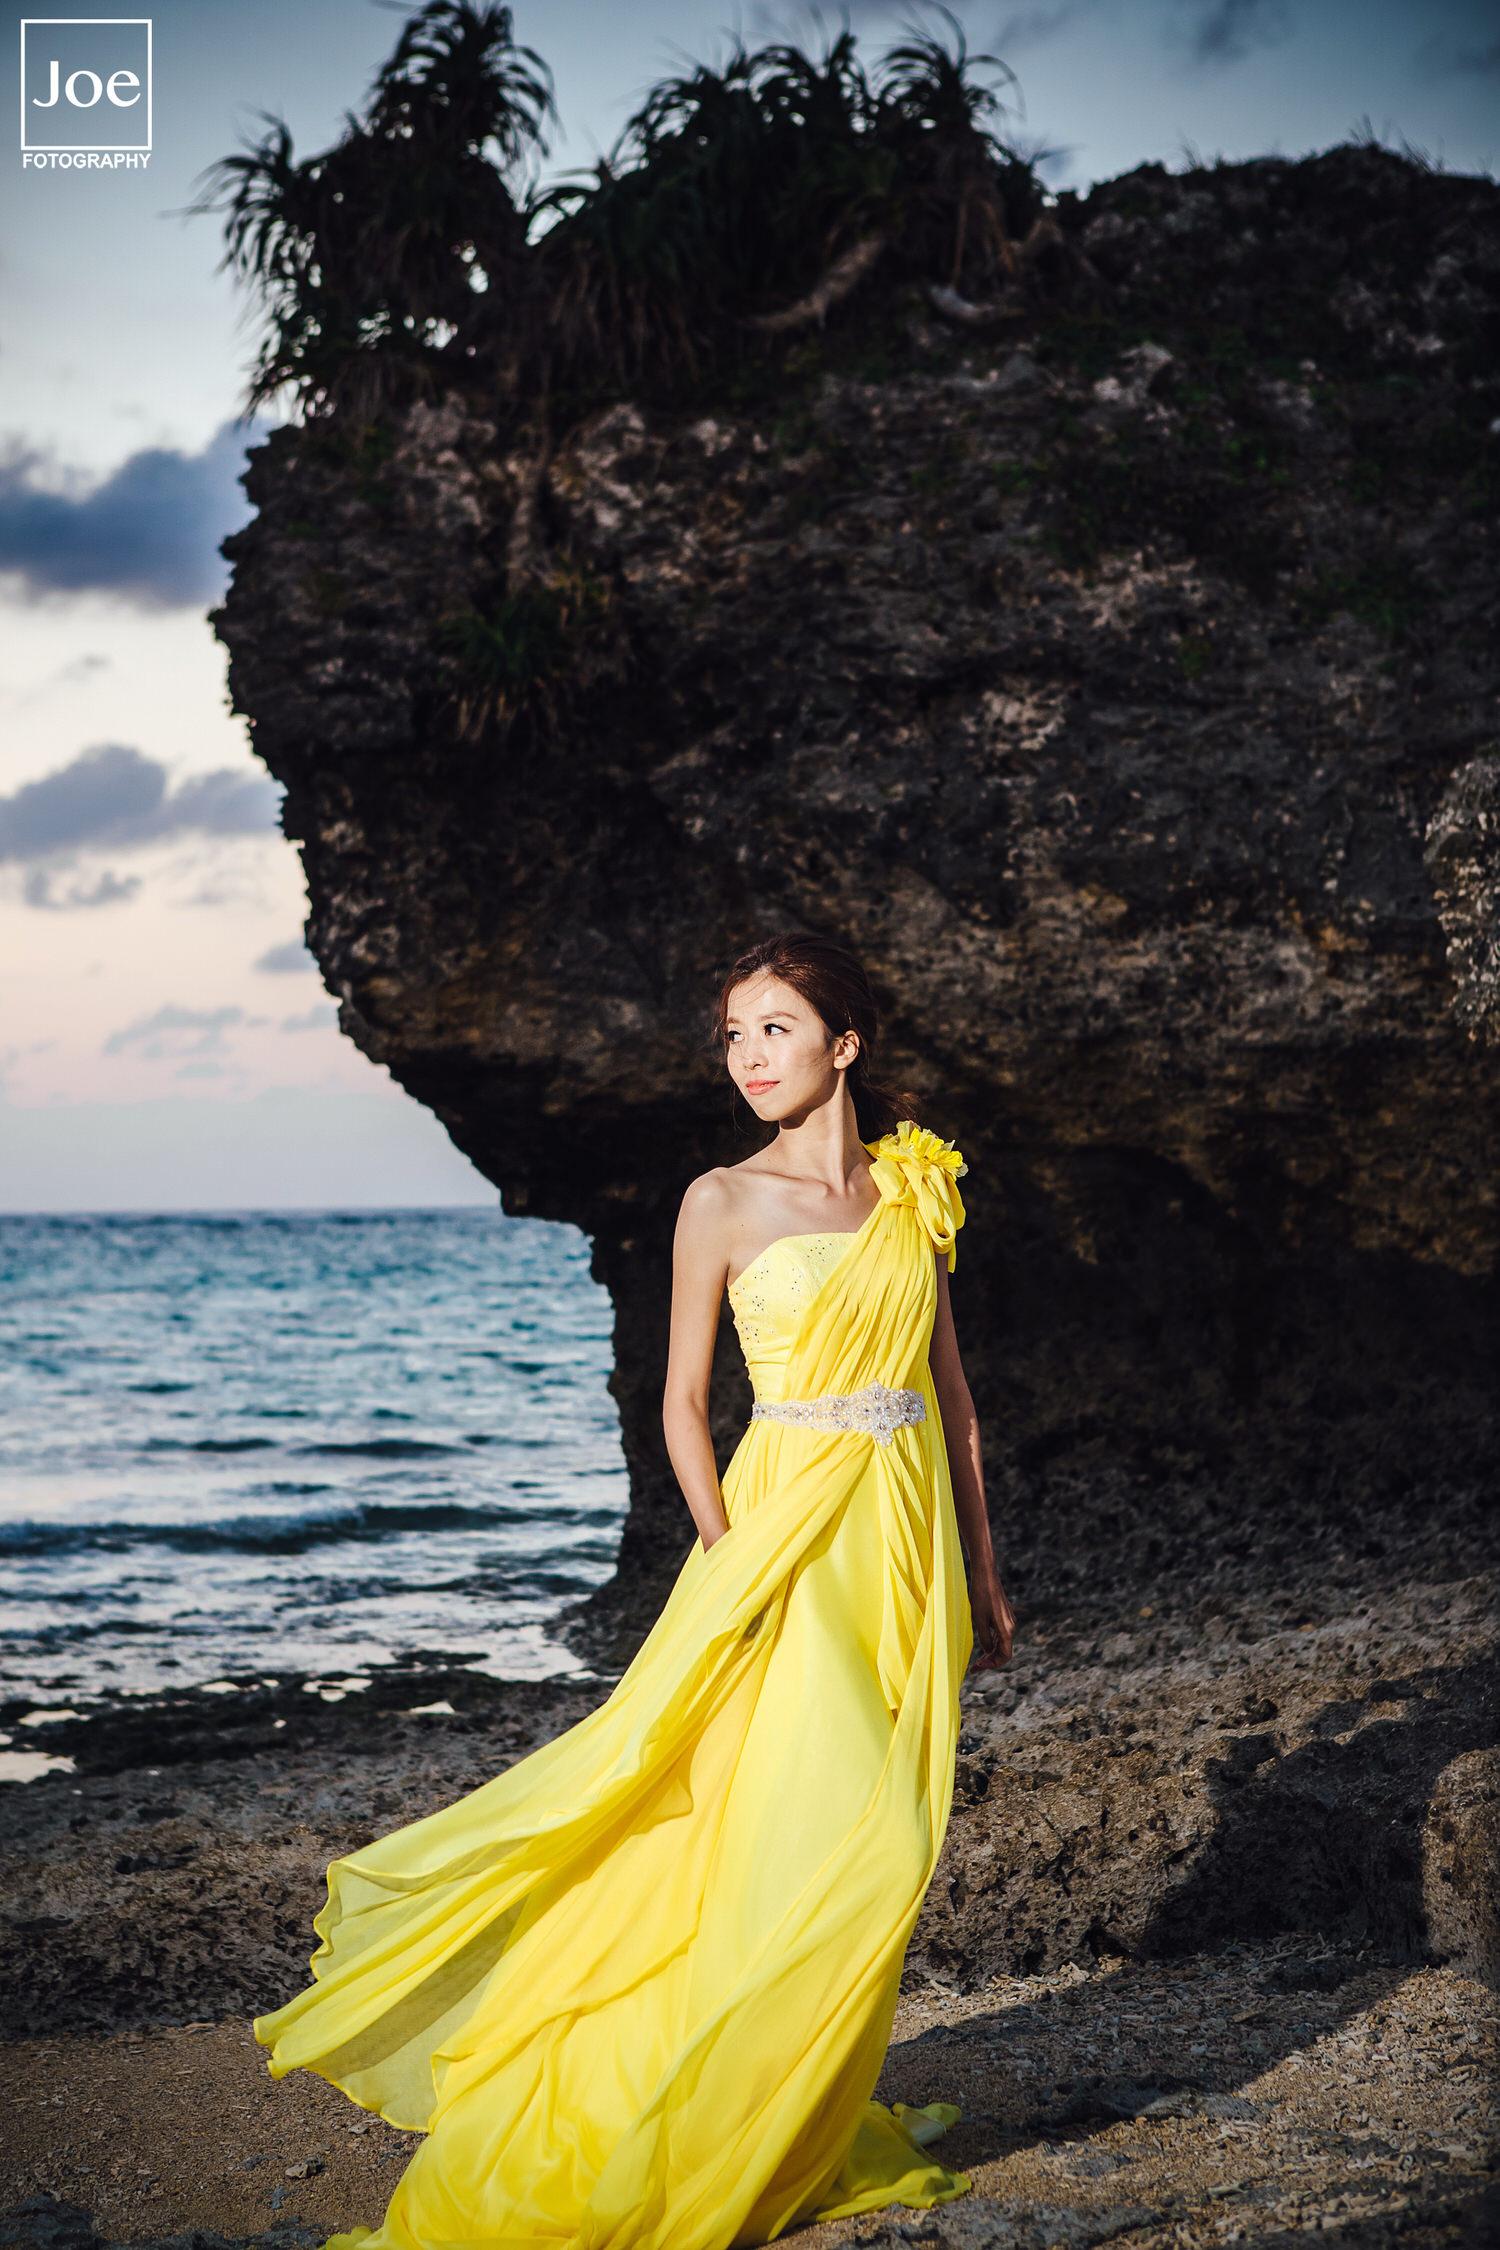 29-okinawa-nirai-beach-pre-wedding-melody-amigo-joe-fotography.jpg